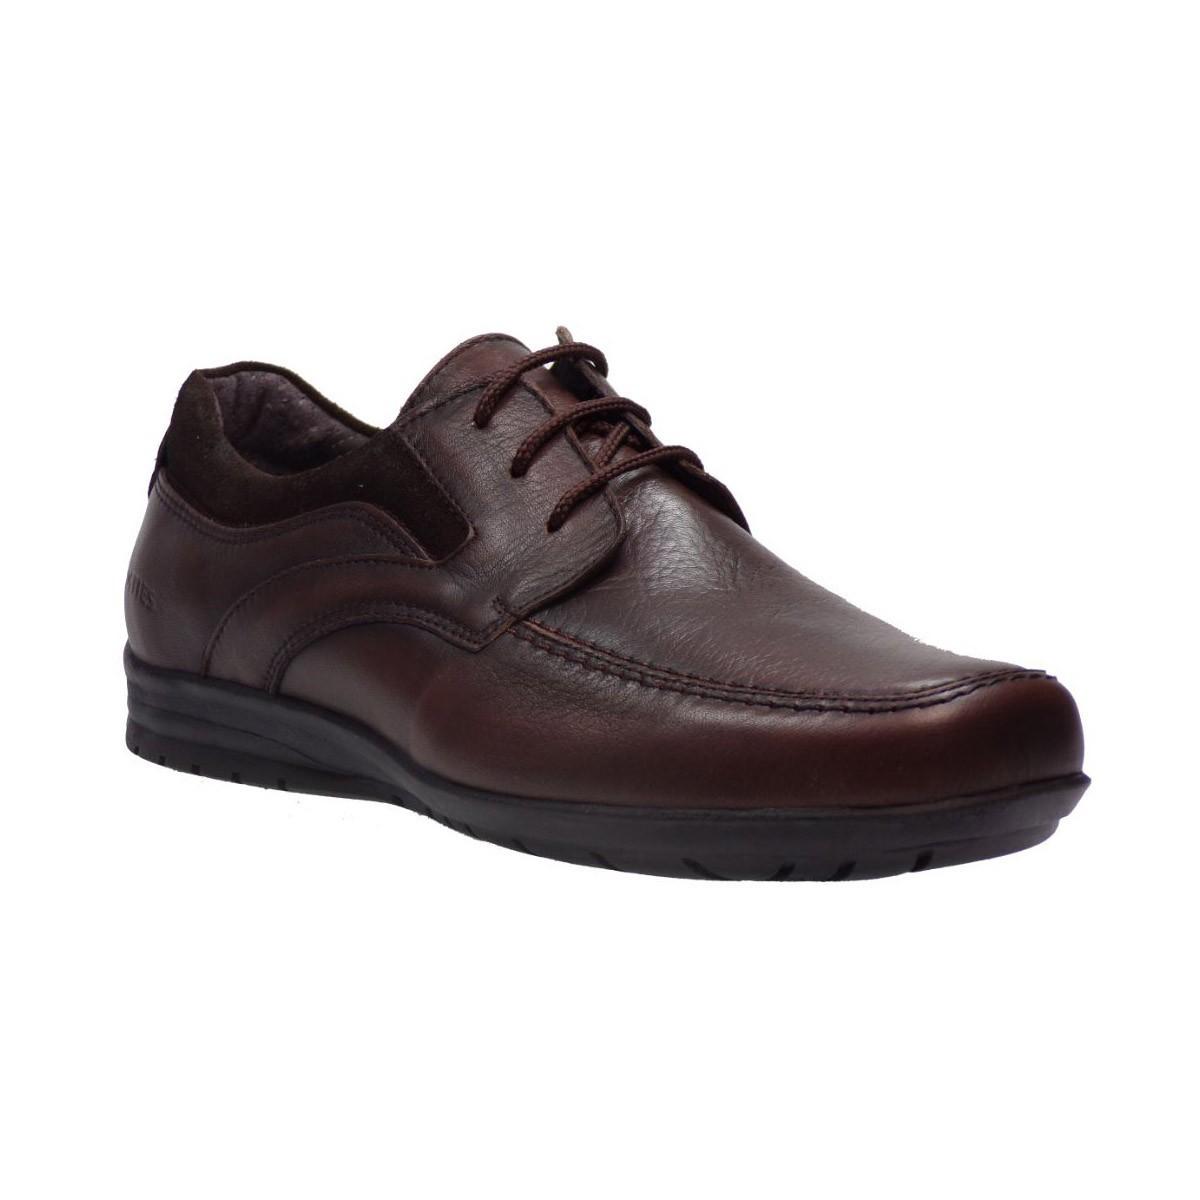 00d84911aef BagiotaShoes Softies Ανδρικά Παπούτσια 6793 Καφέ Softies 6793 kafe